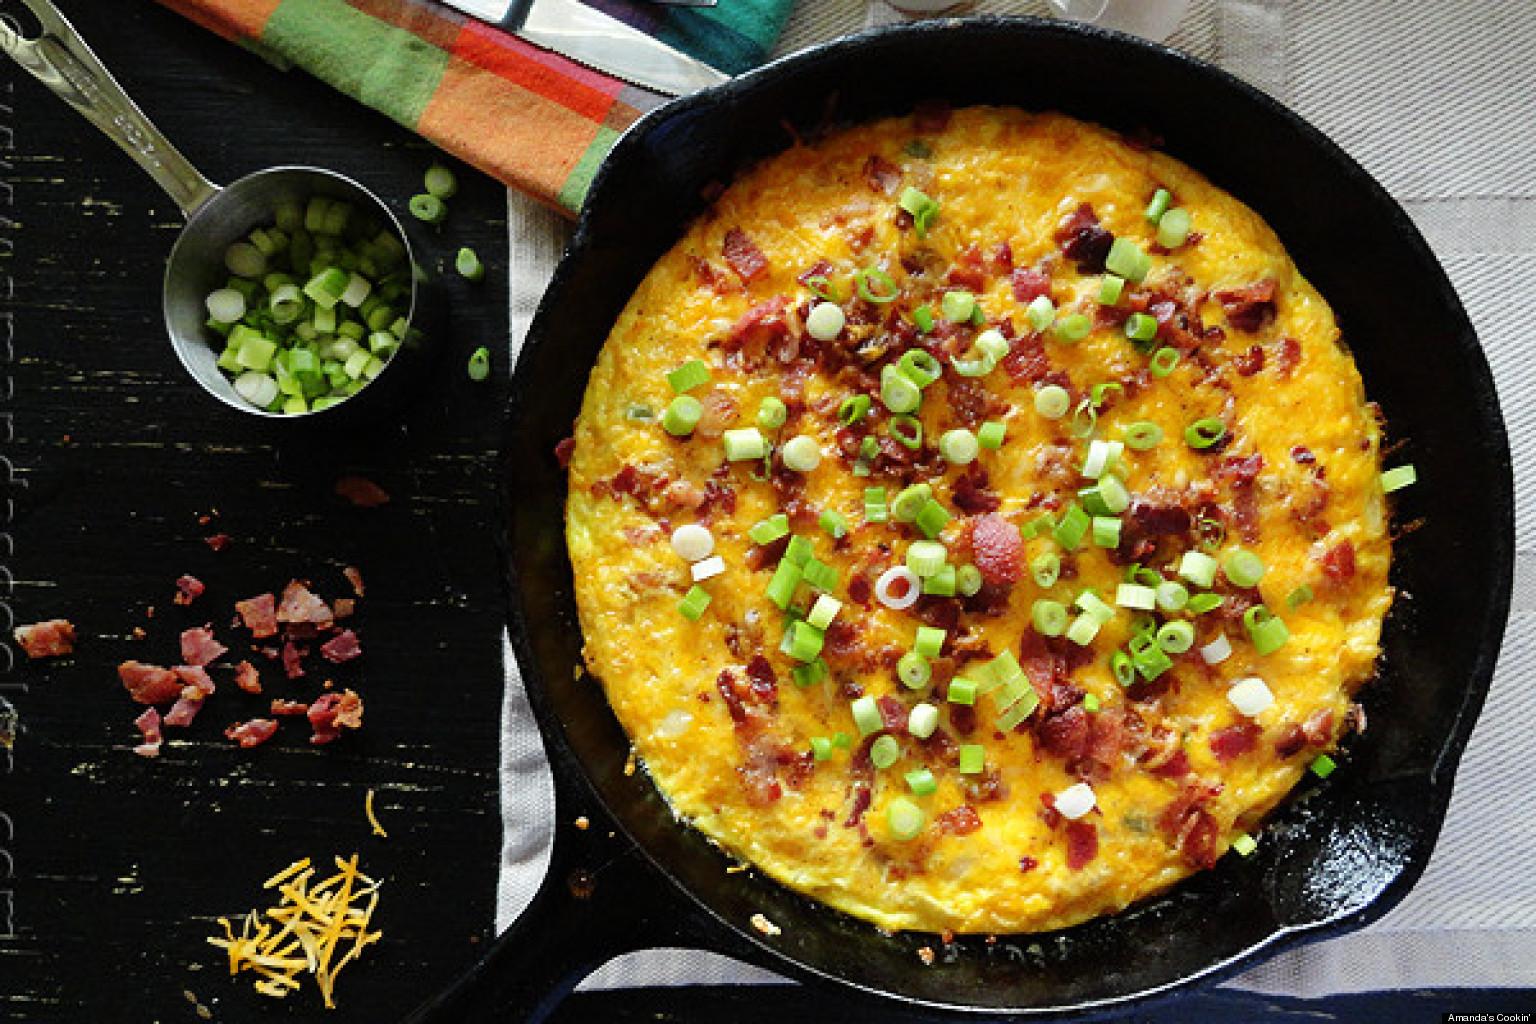 Breakfast-For-Dinner Recipes (PHOTOS)